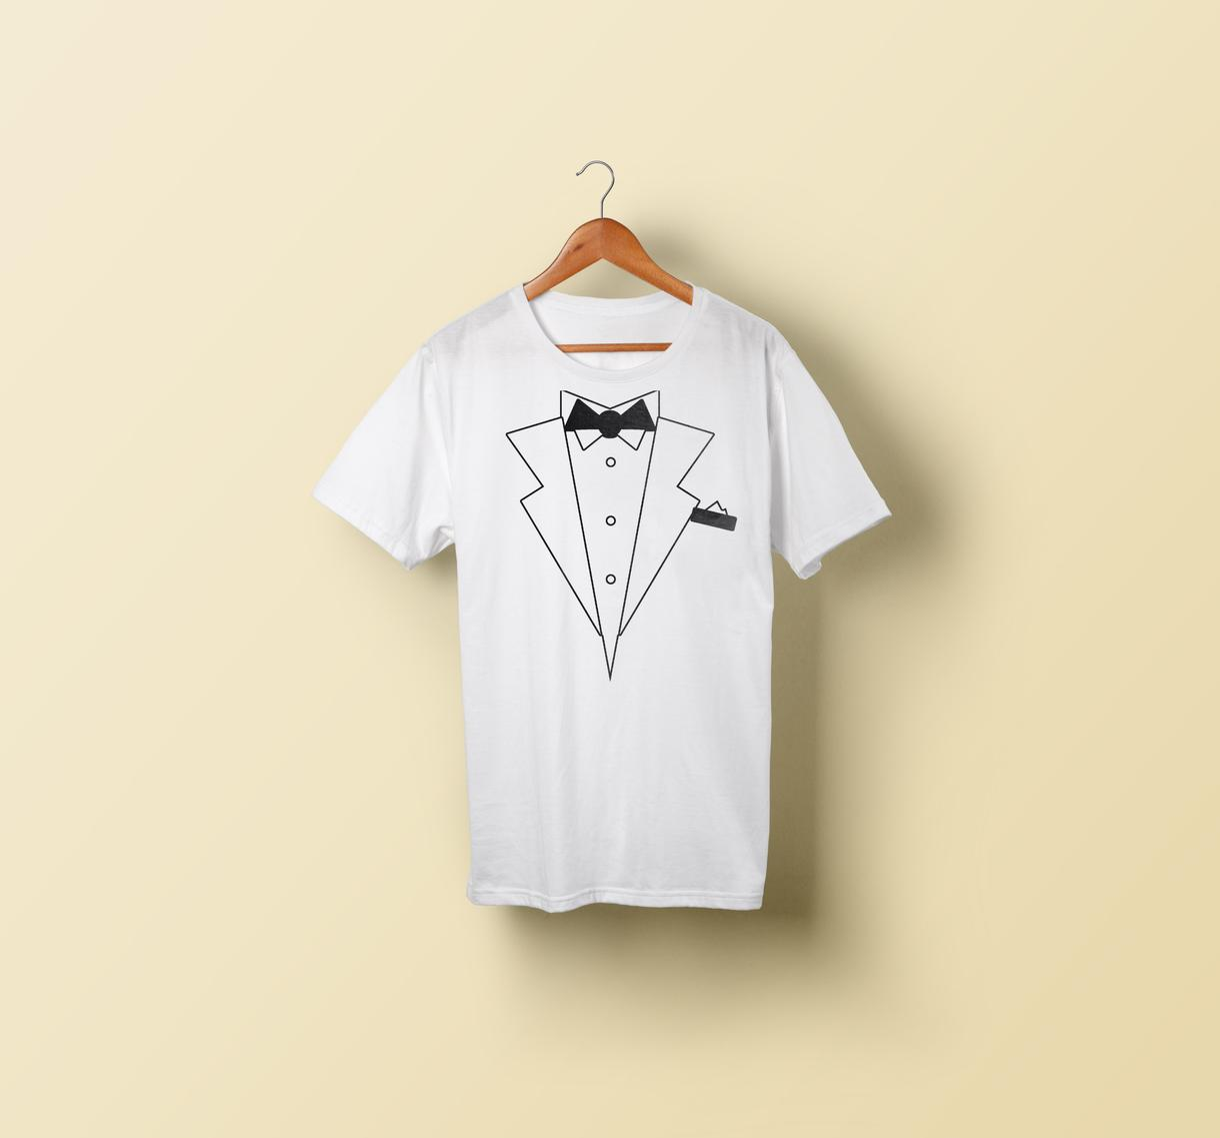 Weddingの引出物やプチギフトになります 結婚式の引出物にオリジナルの物を入れて個性を出したい方必見!